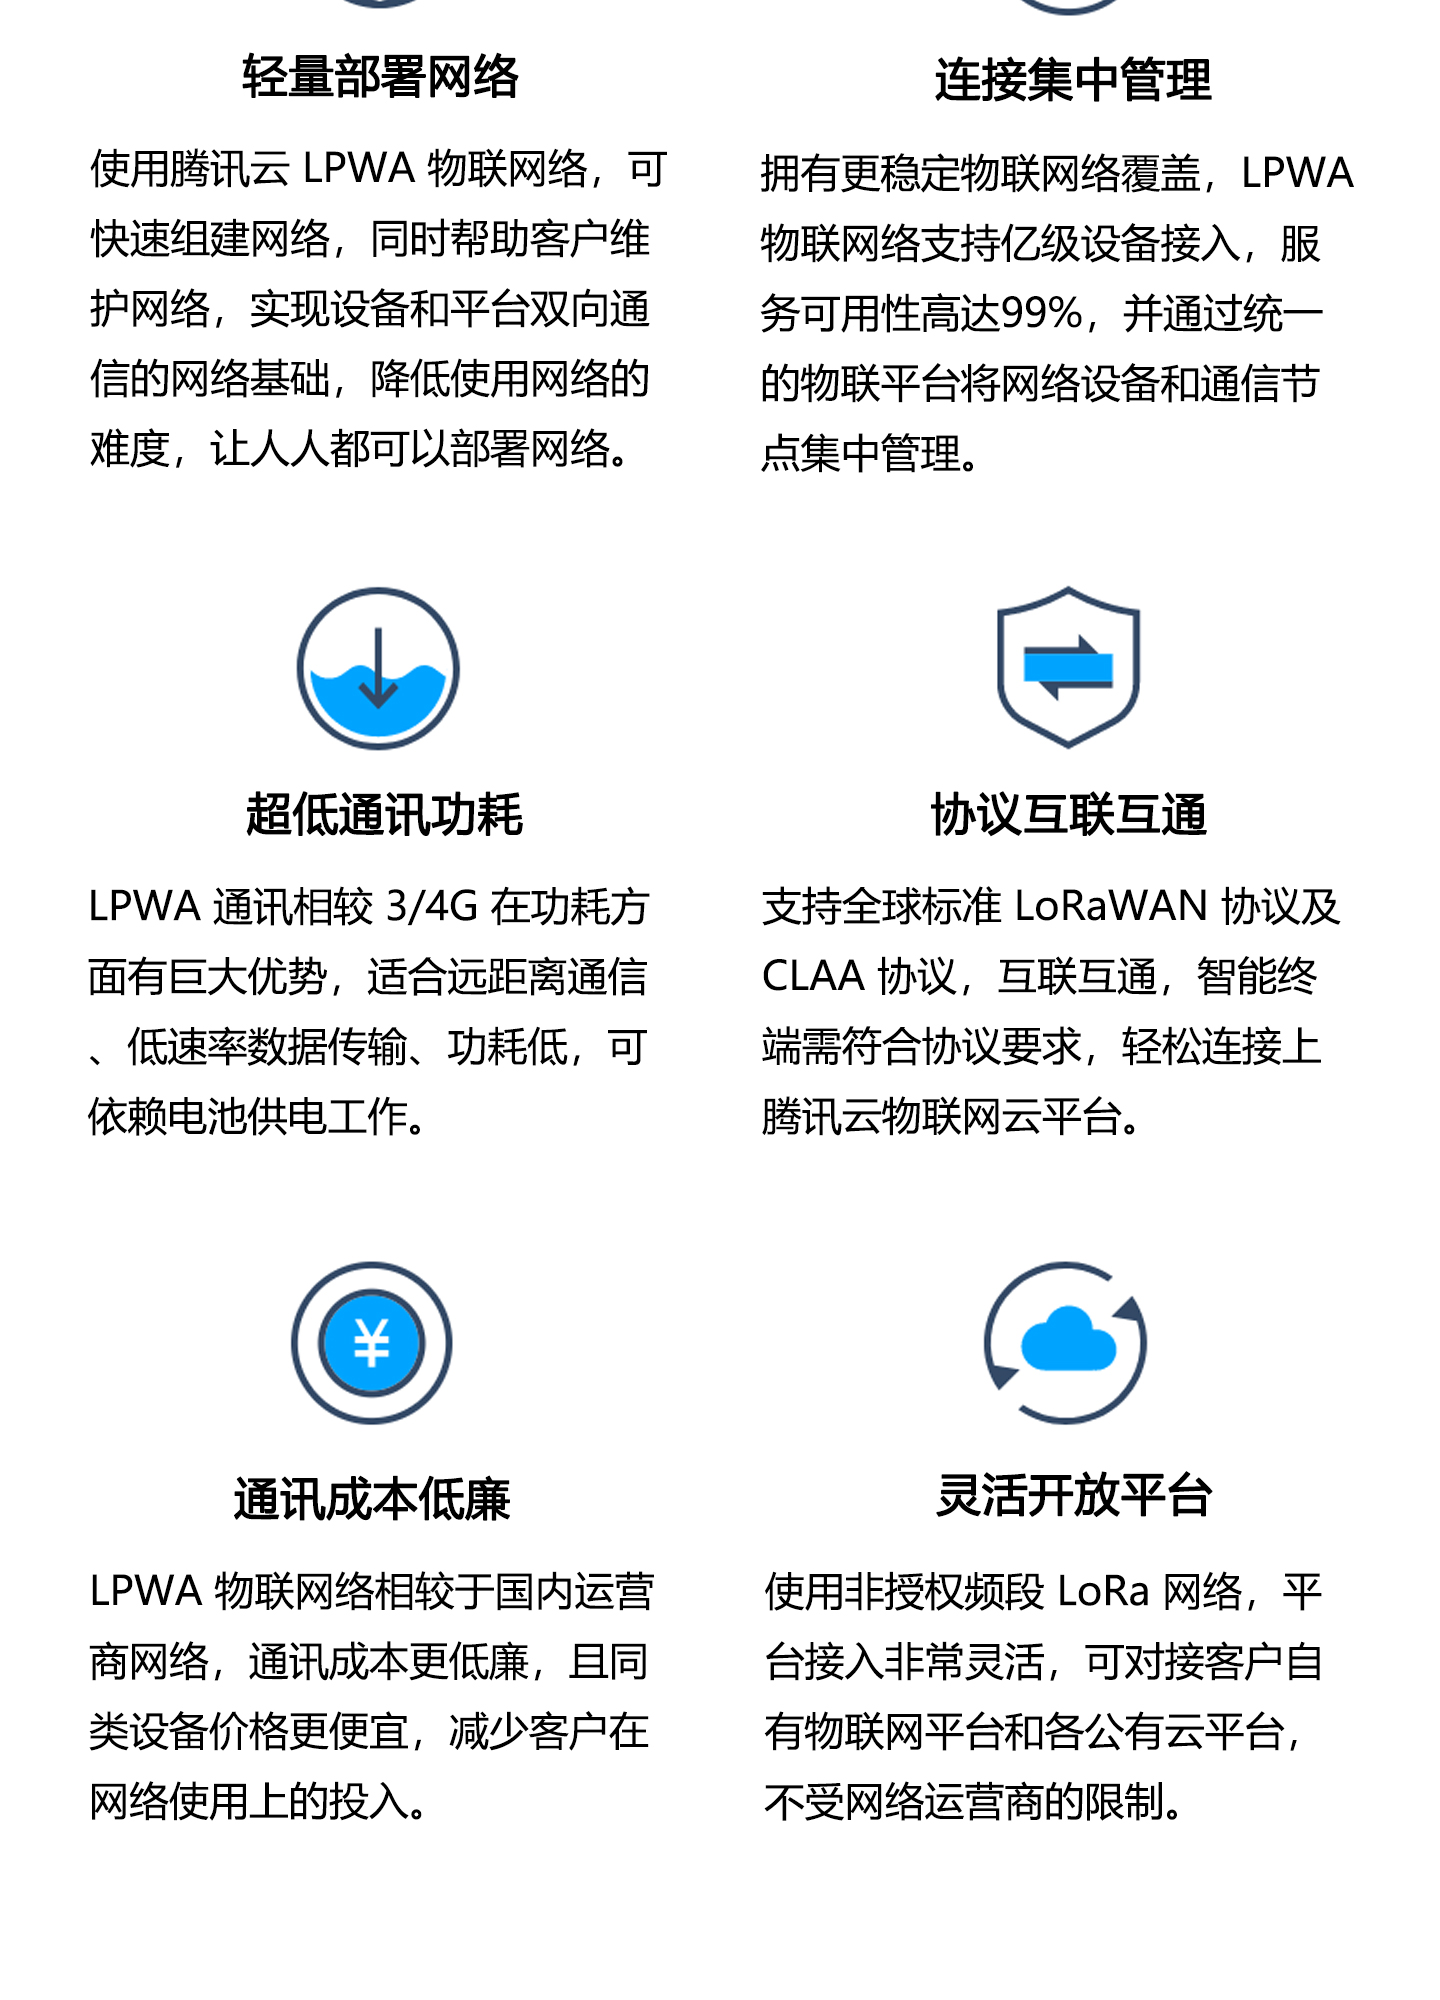 LPWA-物联网络1440_02.jpg